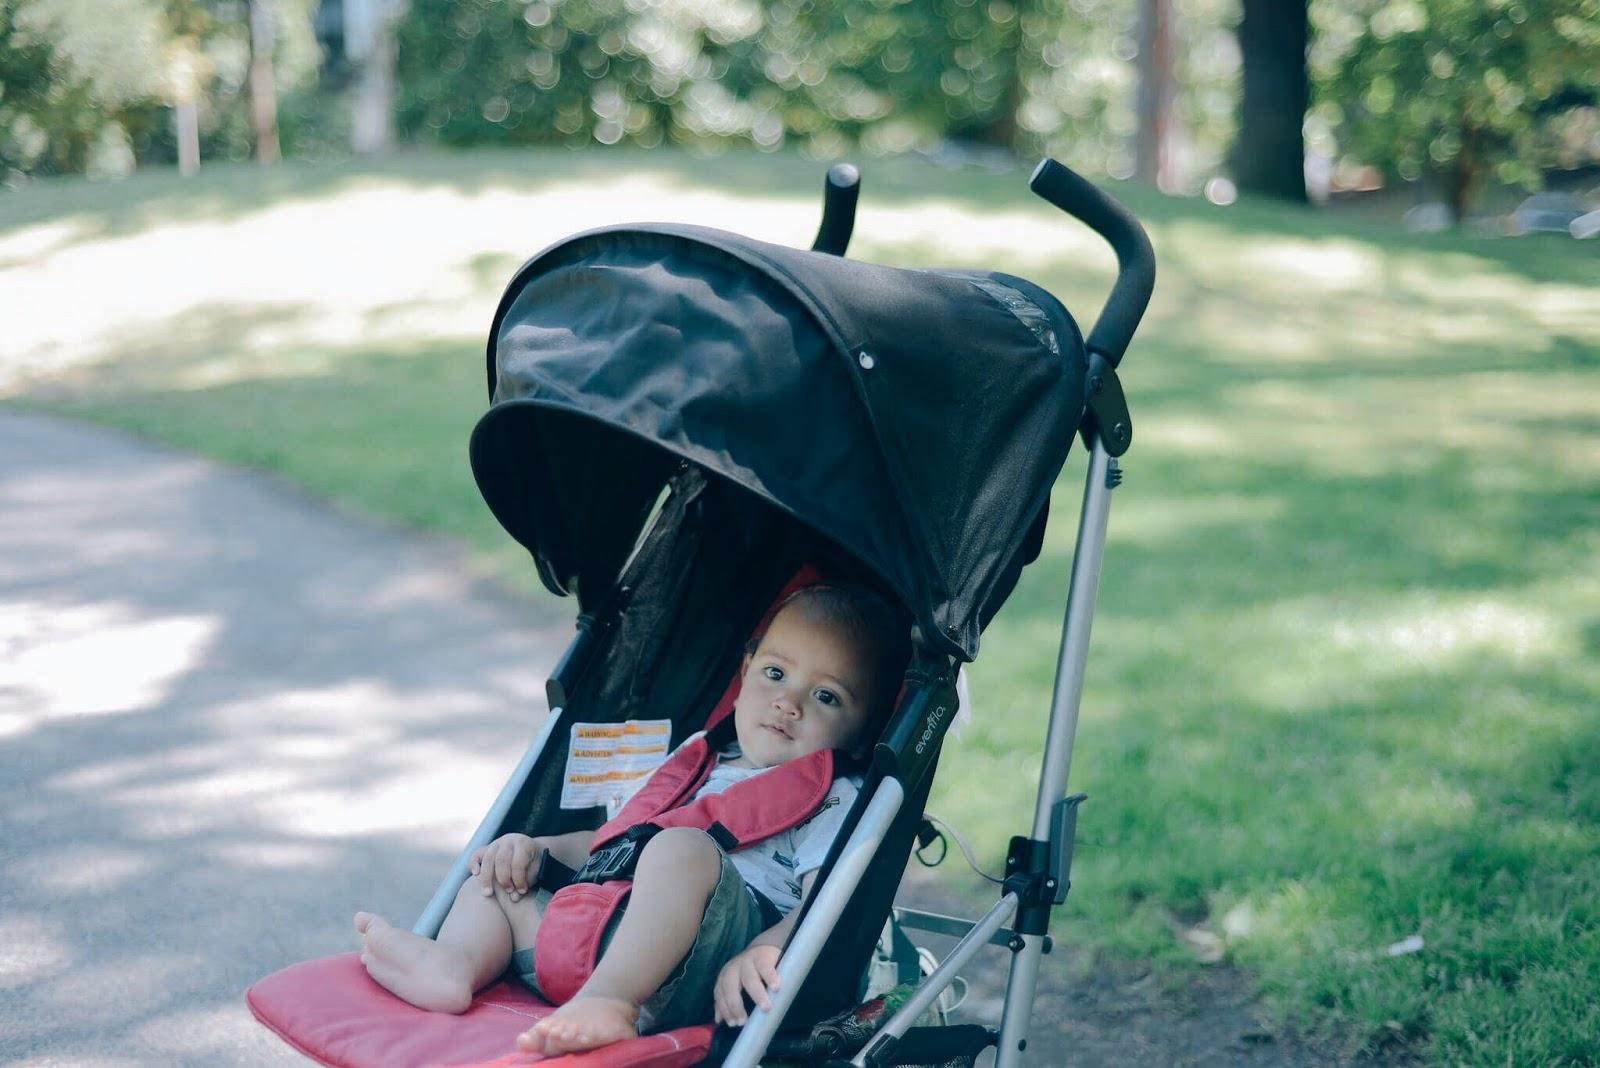 generationevenflo, evenflosummer, baby products, stroller, minno evenflo stroller, portland blogger, mom life, city living, portland, portland mom blogger, mom on the go